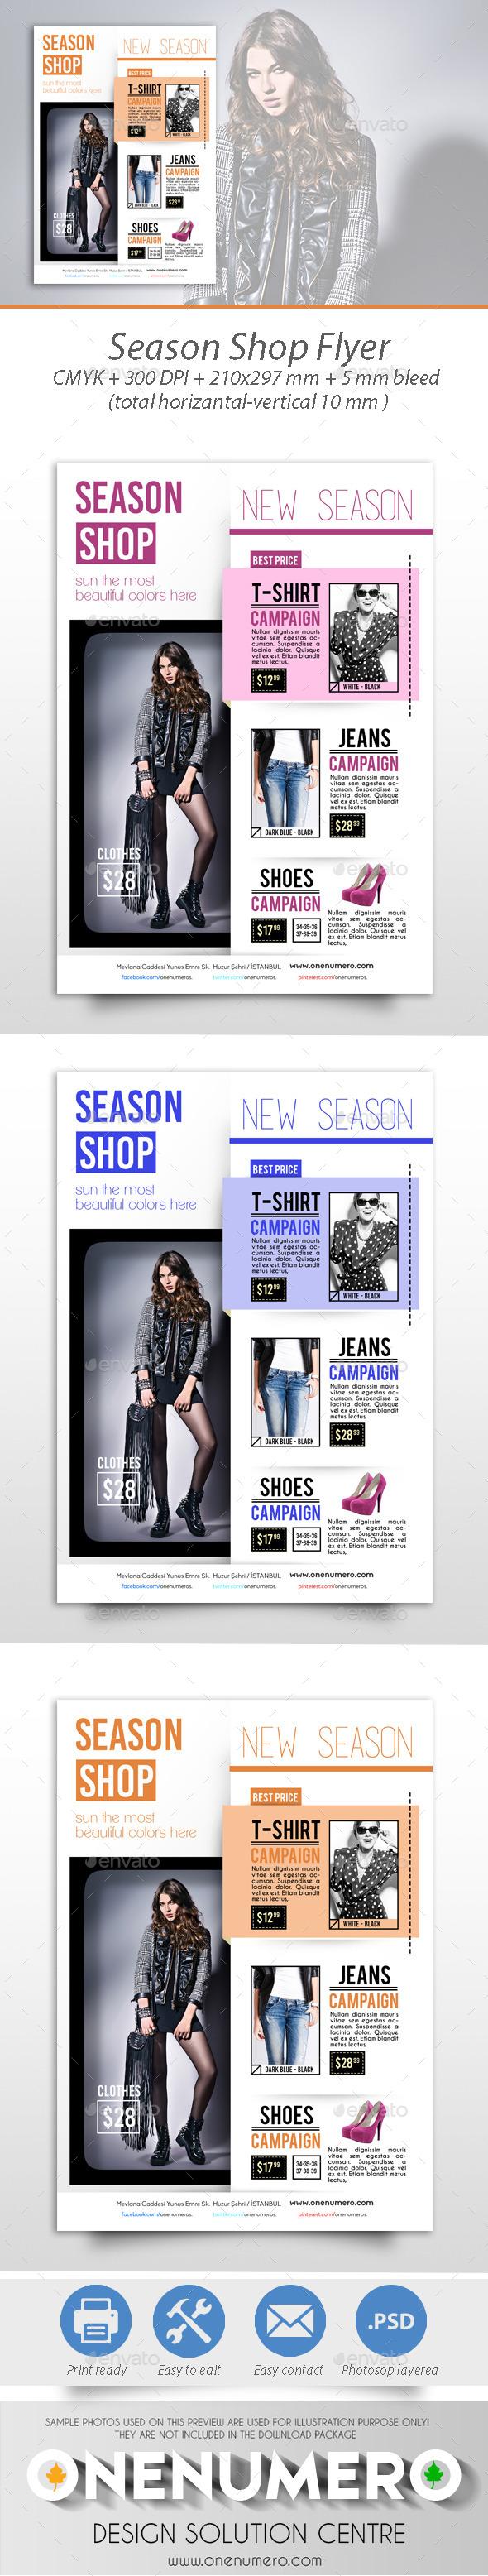 Season Shop Flyer Template - Commerce Flyers